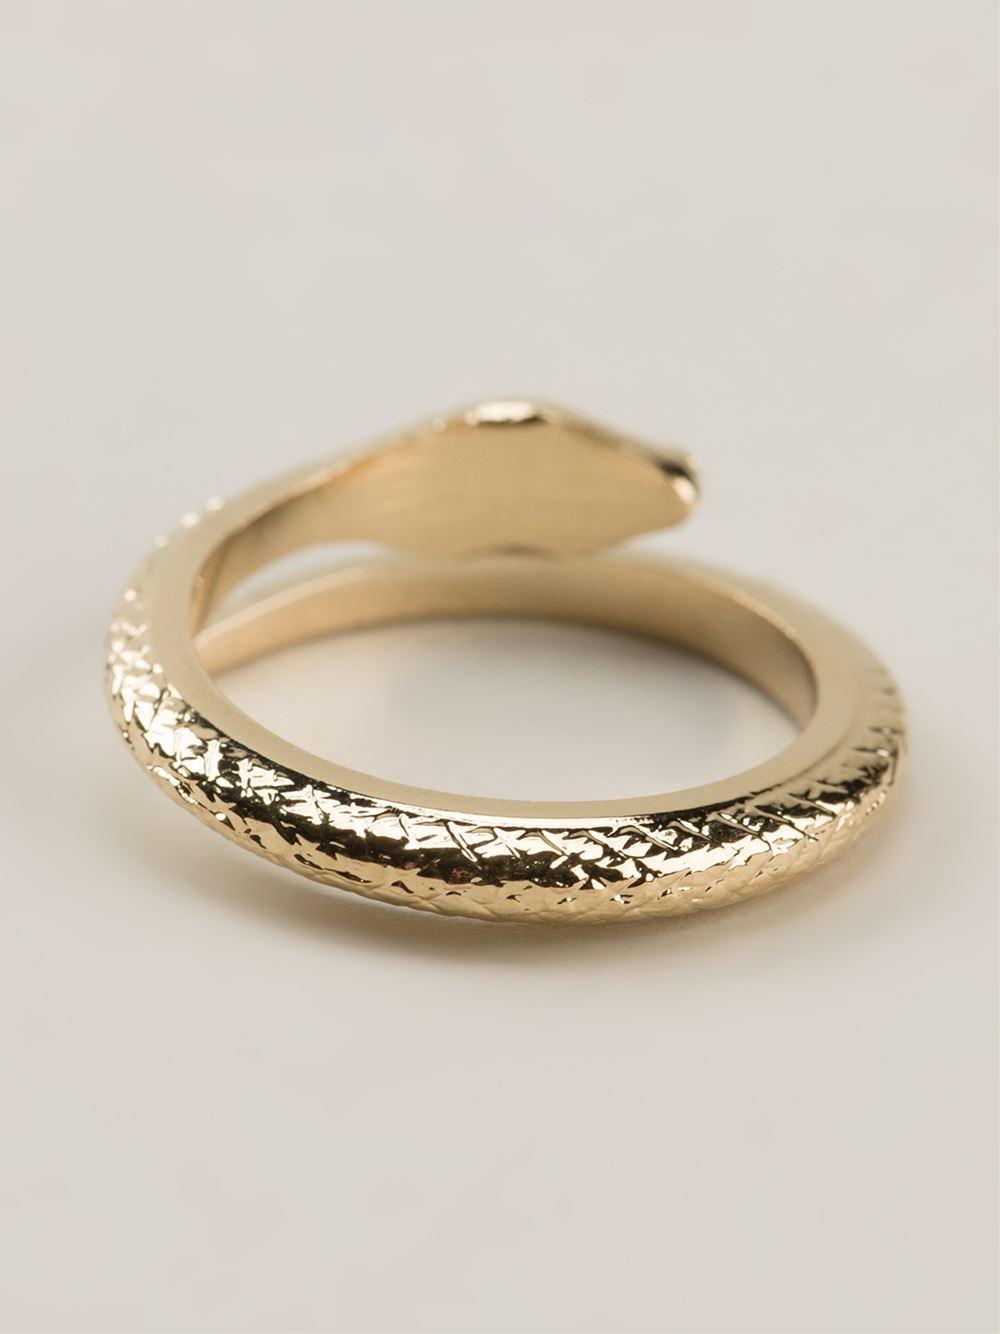 Lyst Isabel Marant Snake Ring in Metallic